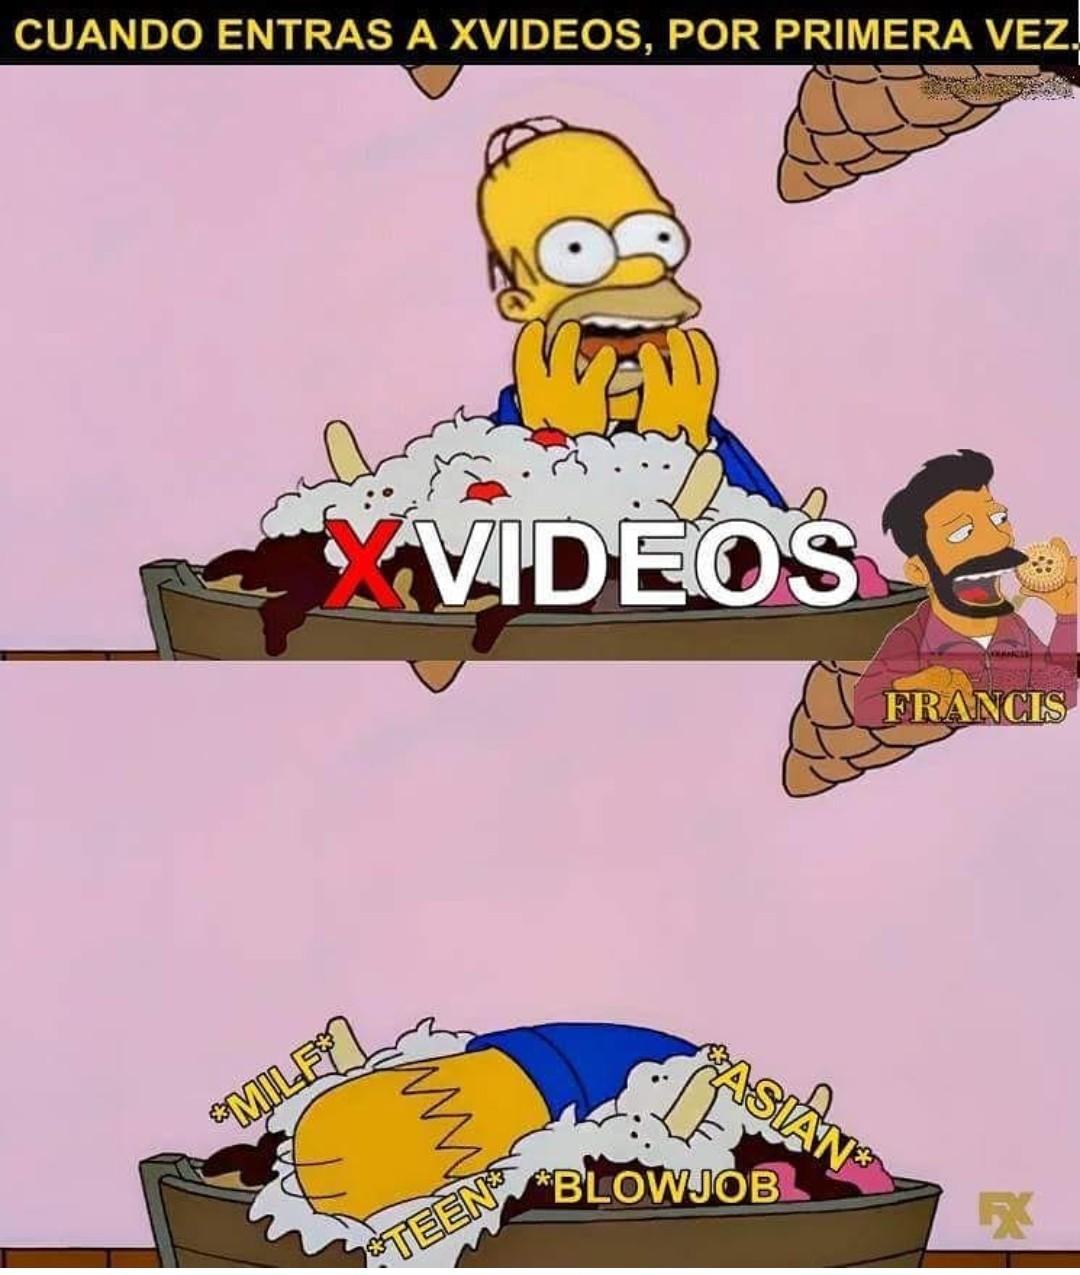 Nopor - meme